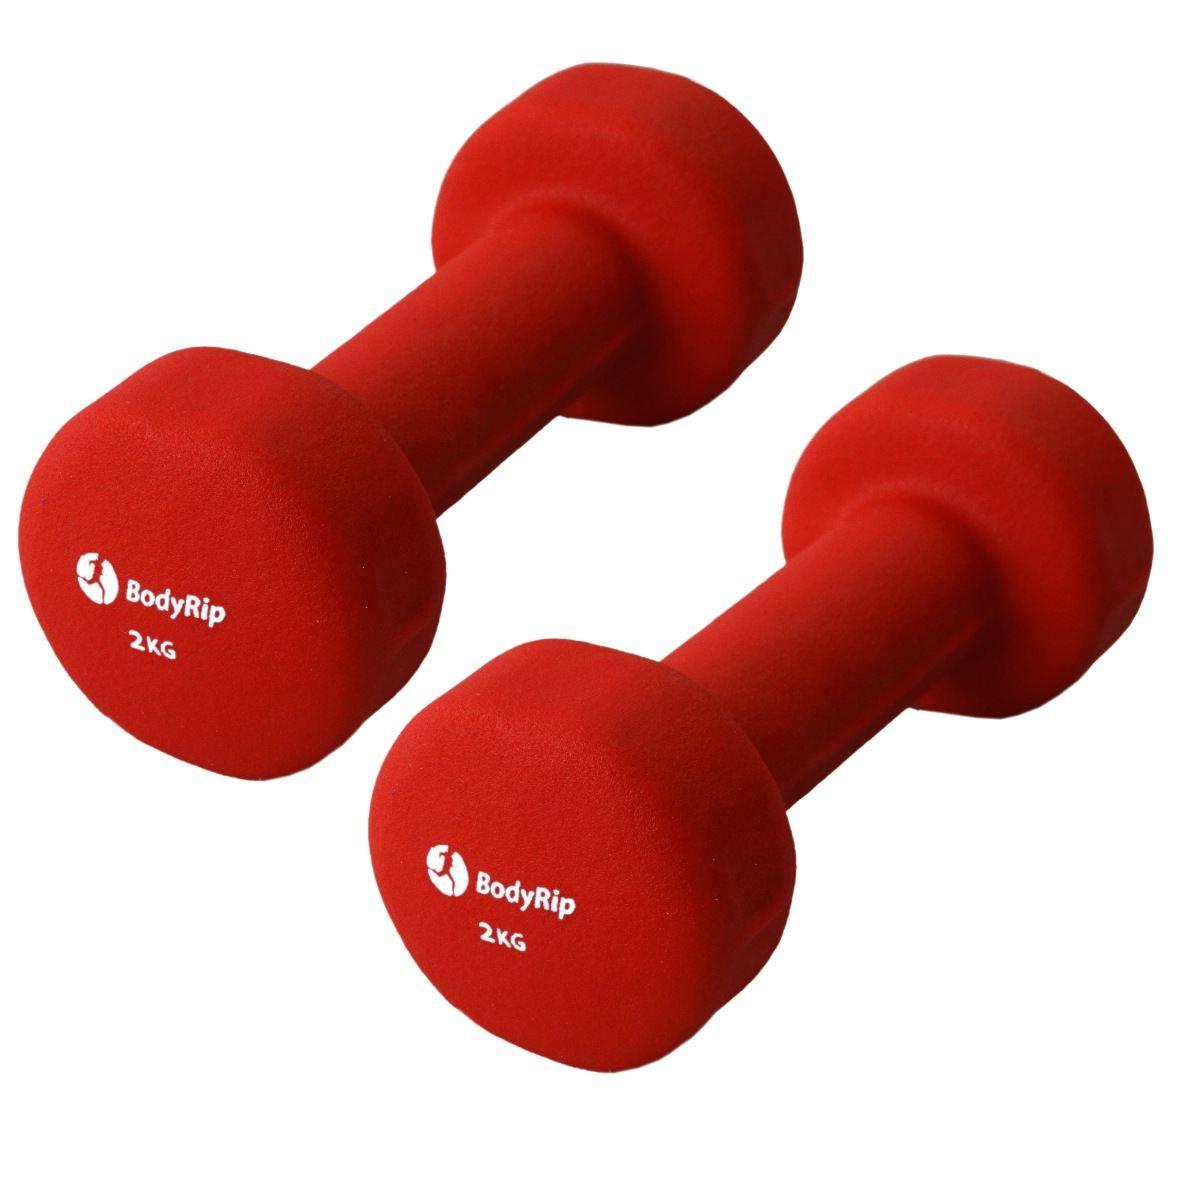 Free Weights Planet Fitness: BodyRip Fitness Neoprene Neo Hand Weights Dumbbells 1Kg